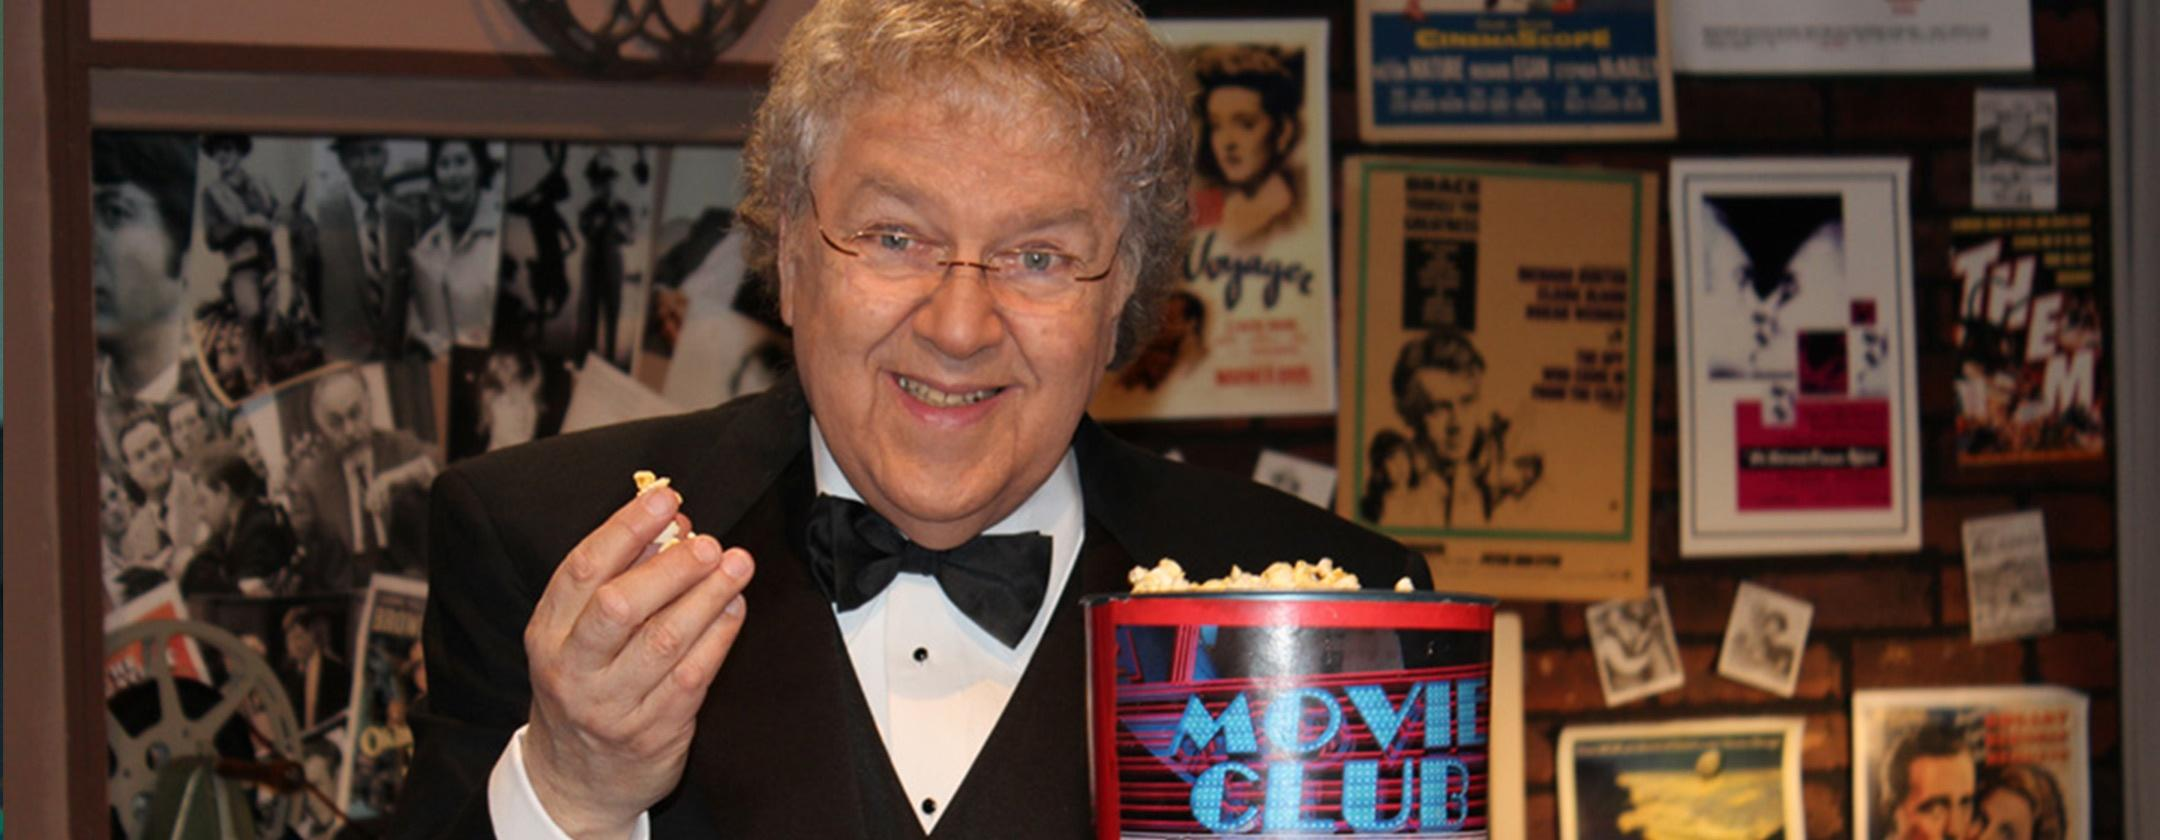 BJ Wexler, Host of OETA Movie Club